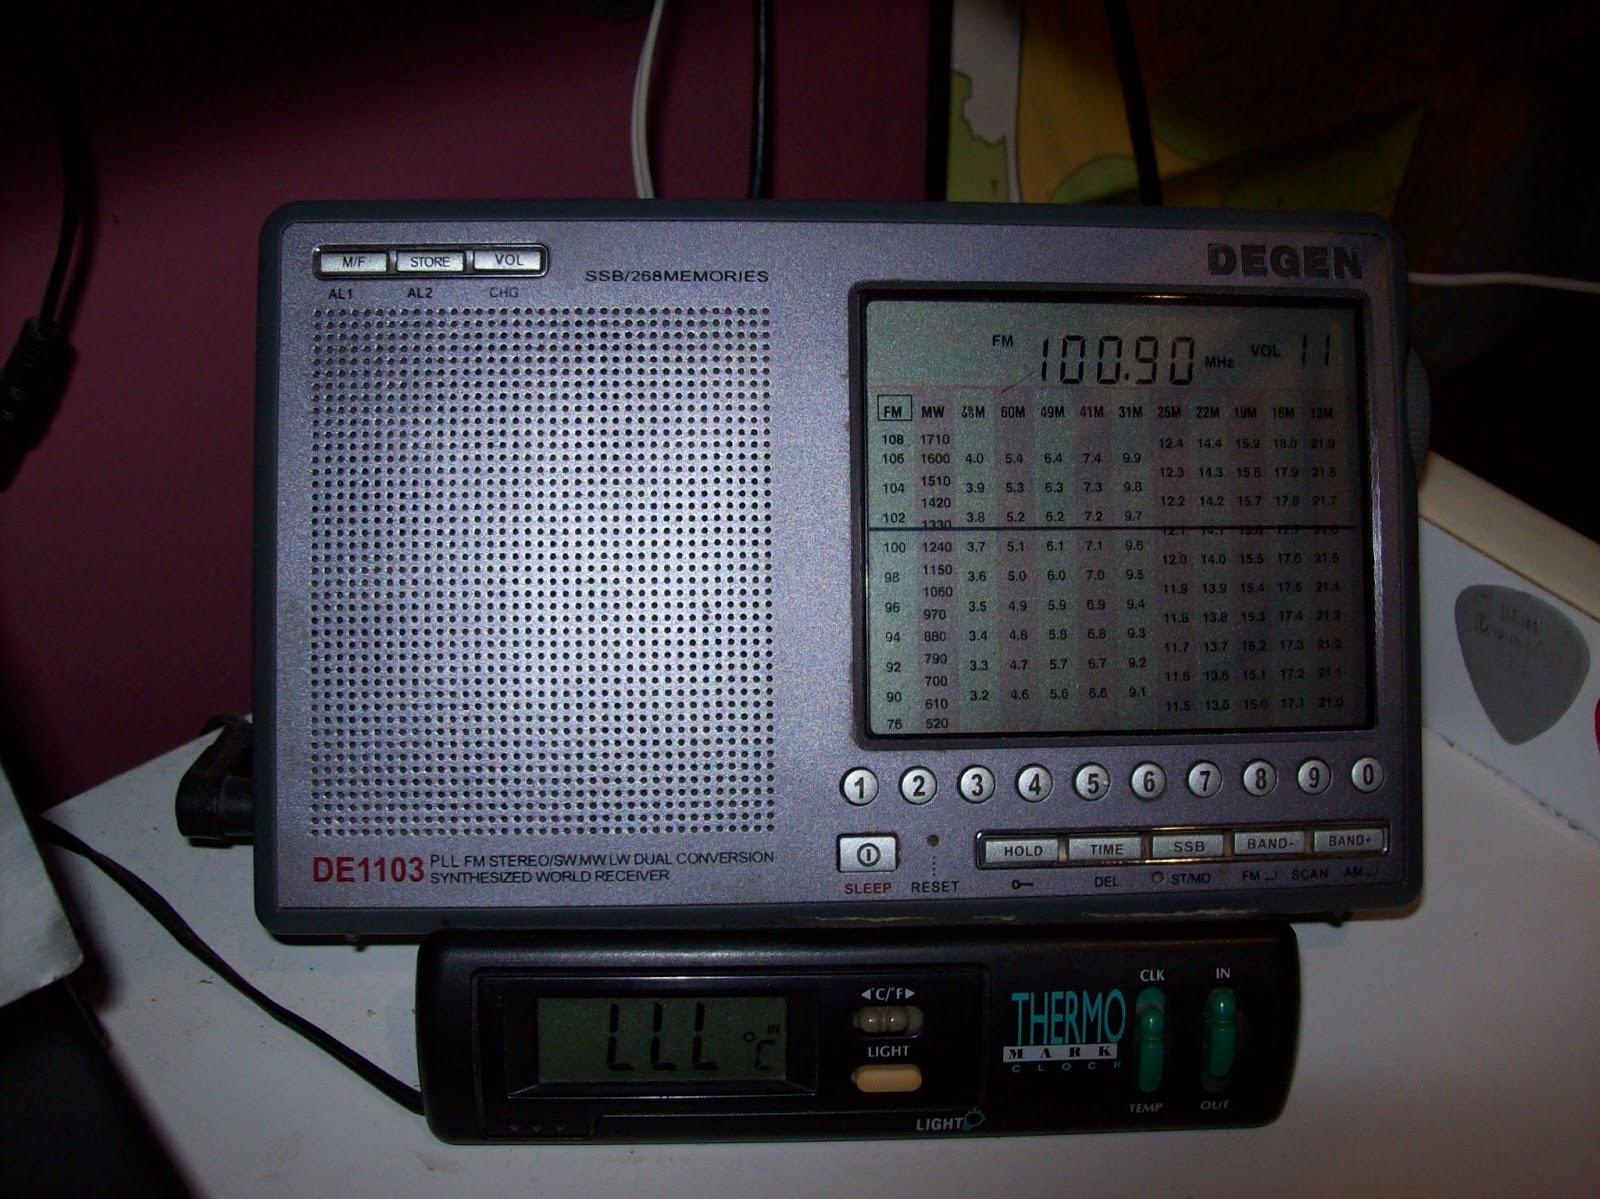 Mic Wiring Also I Radio Mic Wiring Diagram Besides Cobra 142 Gtl Mic